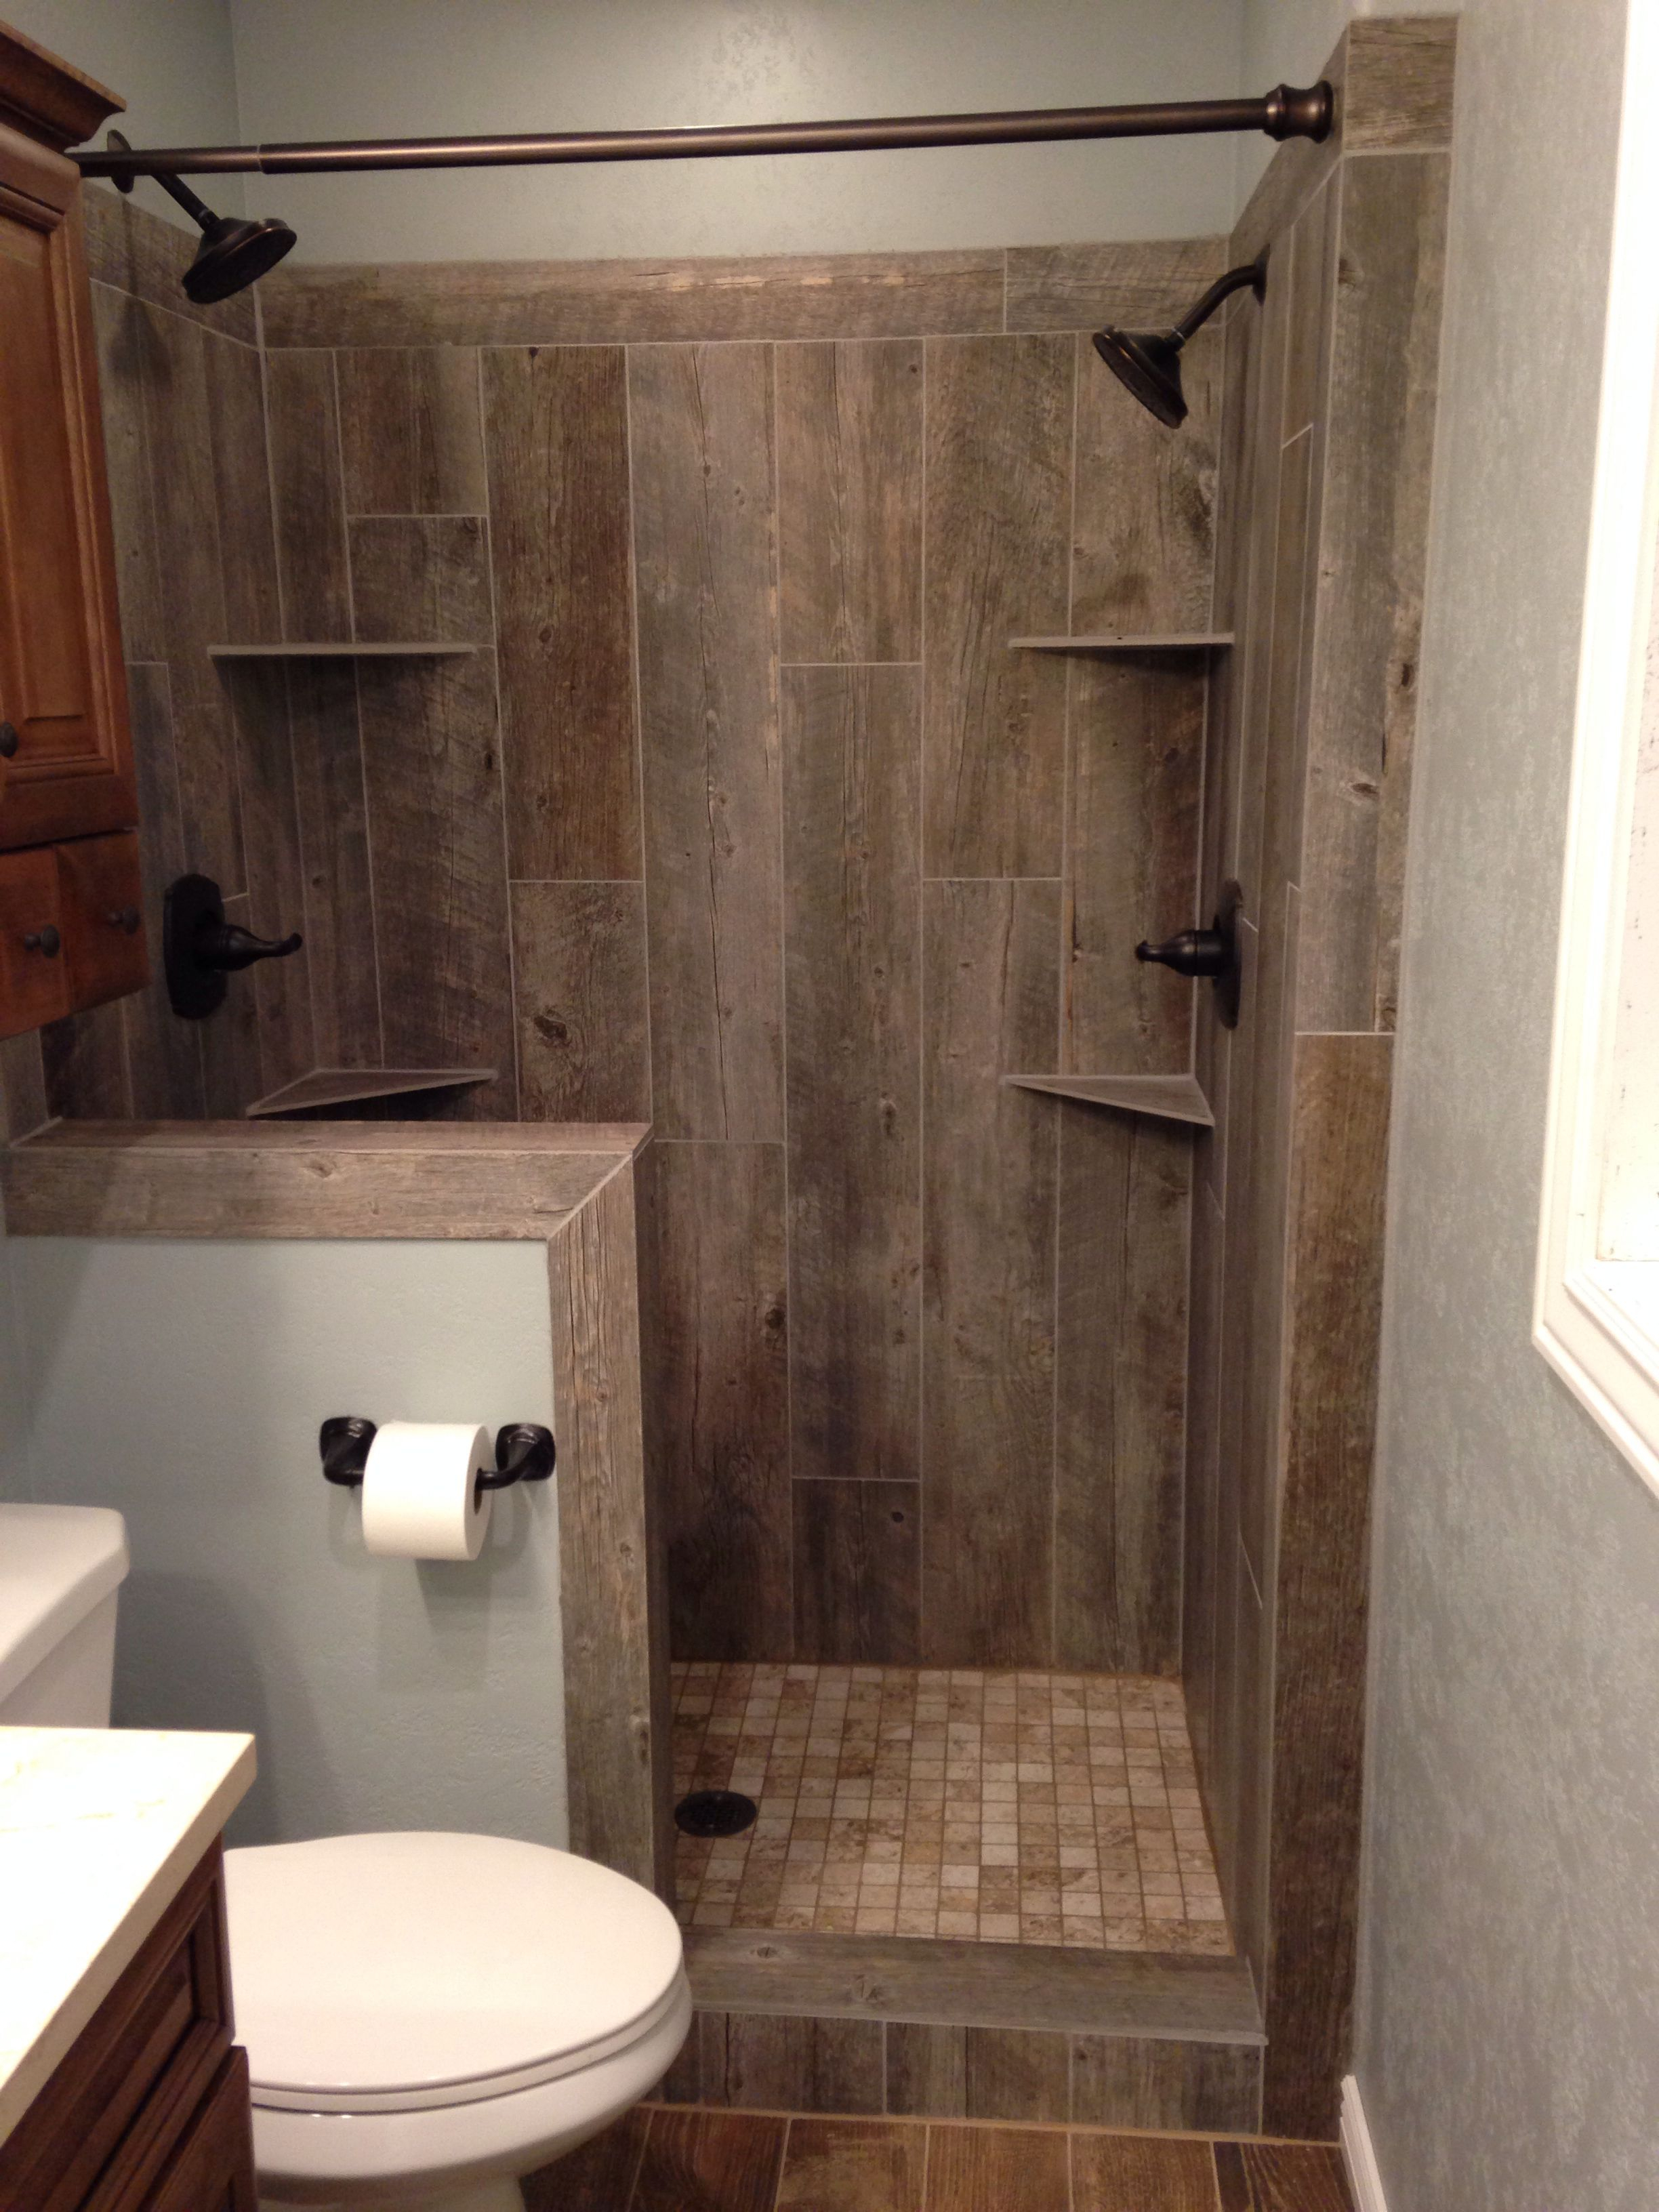 23 Stunning Tile Shower Designs In My House Shower Tile regarding dimensions 2448 X 3264